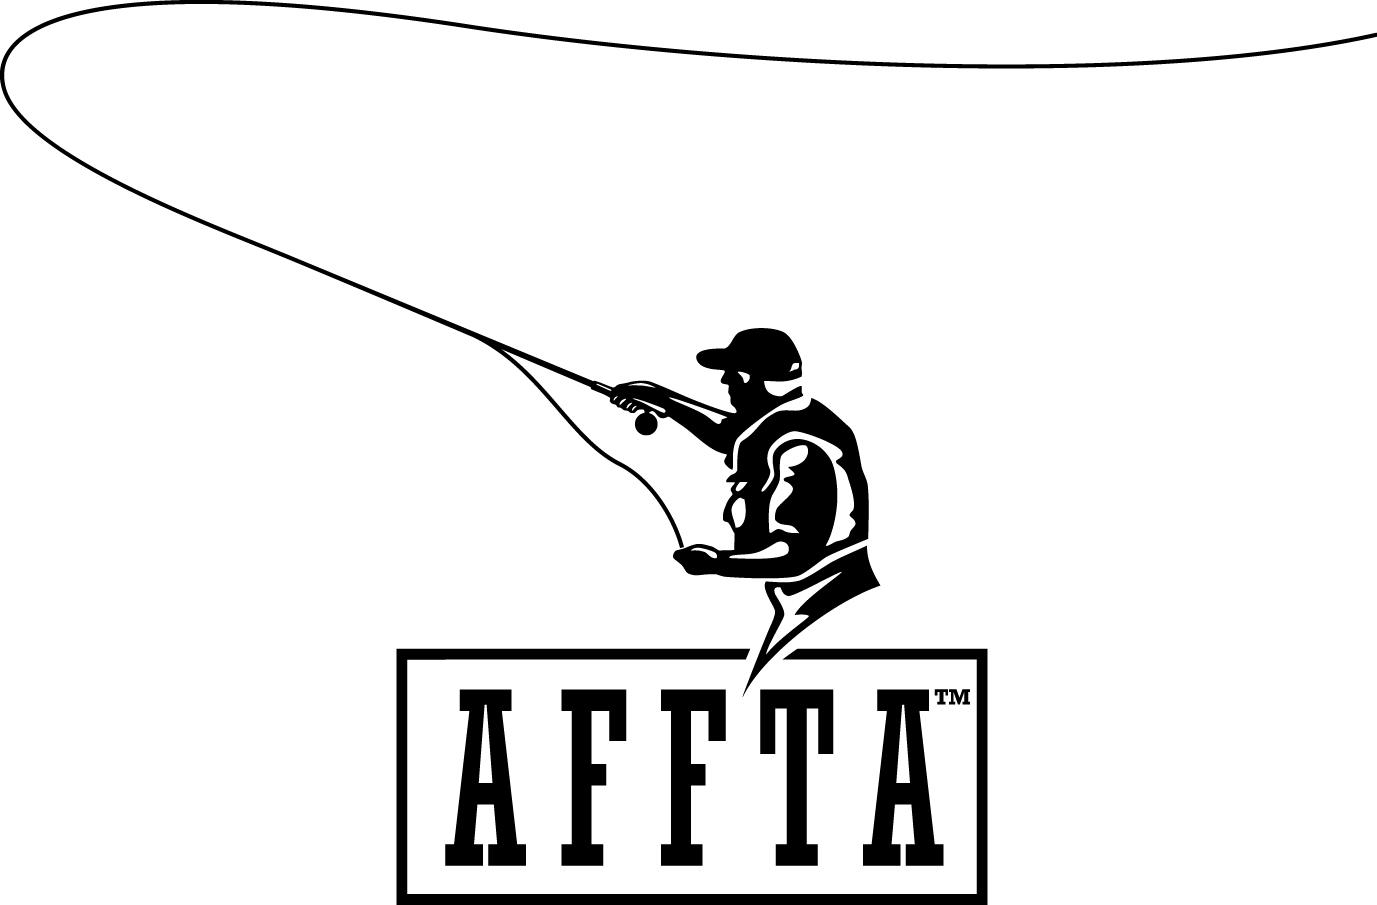 American Fly Fishing Trade Association